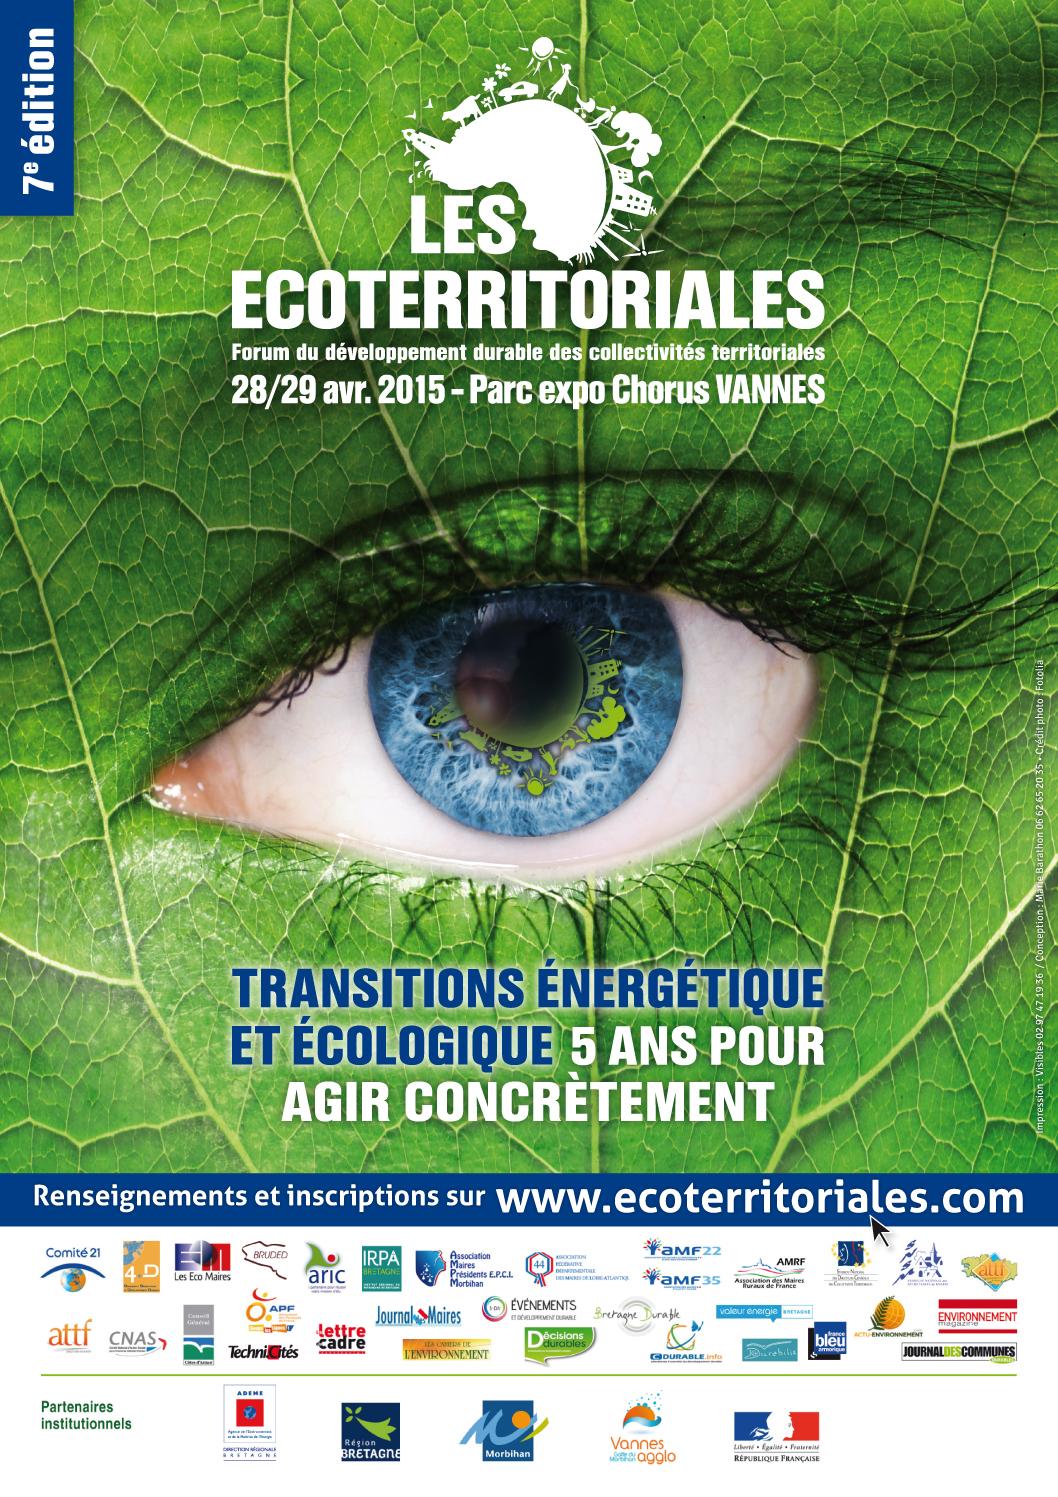 Affiche / Ecoterritoriales